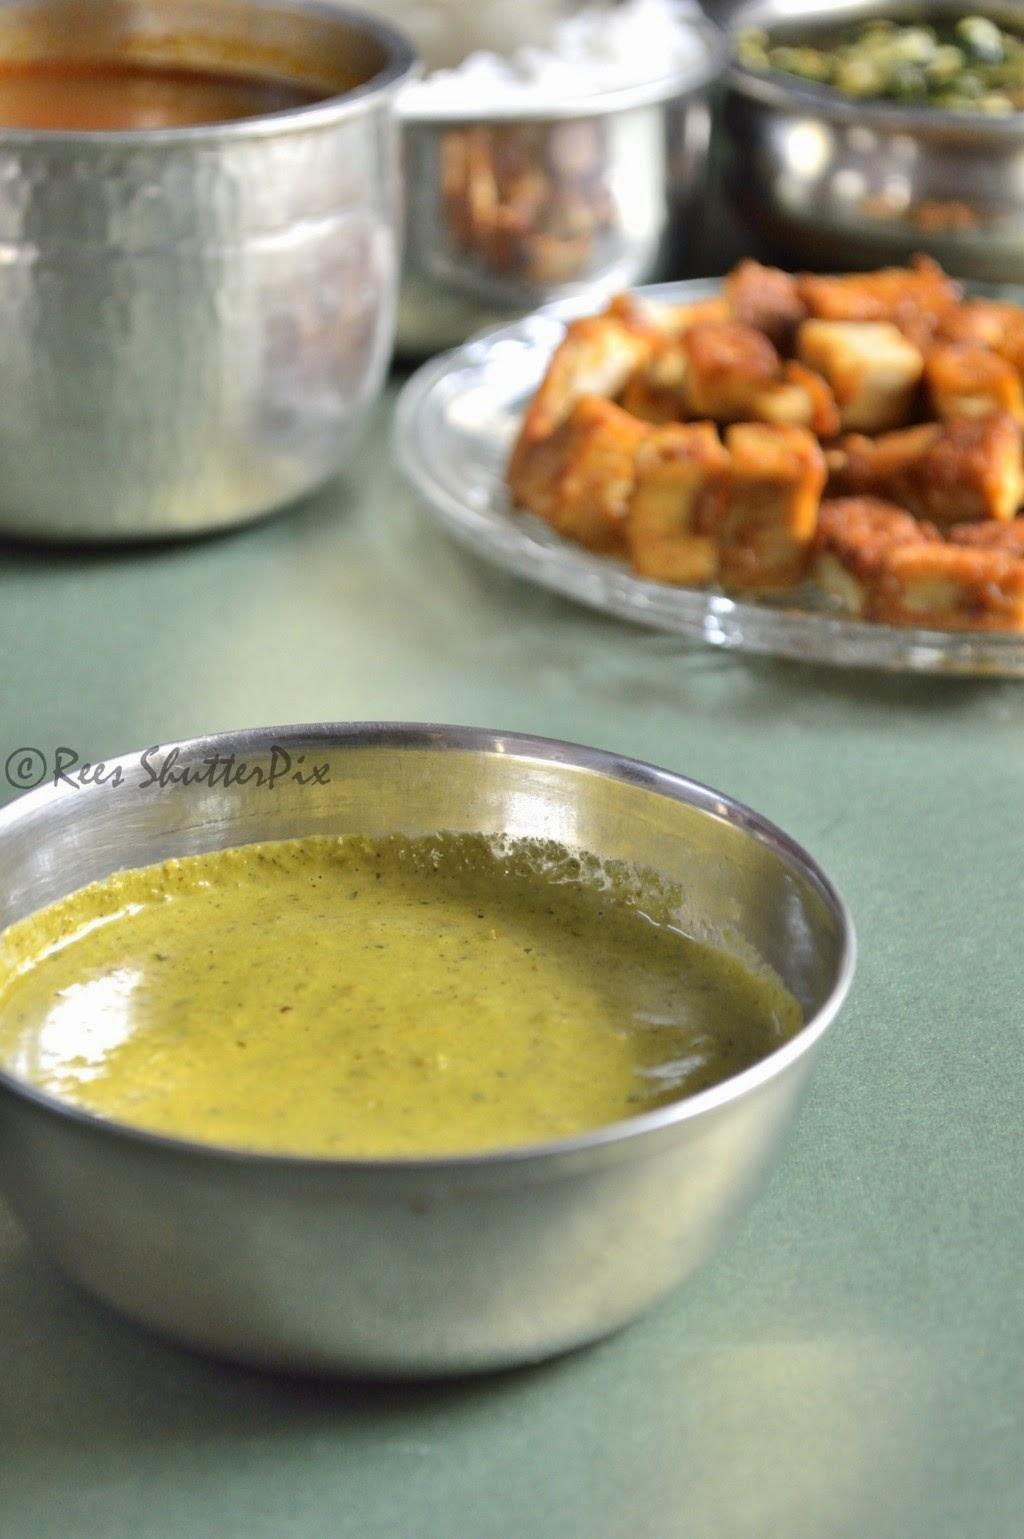 Thuthuvalai Thogayal Recipe   Solanum Trilobatum Thogayal Recipe , thuthuvalai thovayal fro cold and cough recipe, cough medicine recipe, thoodhuvalai recipes,